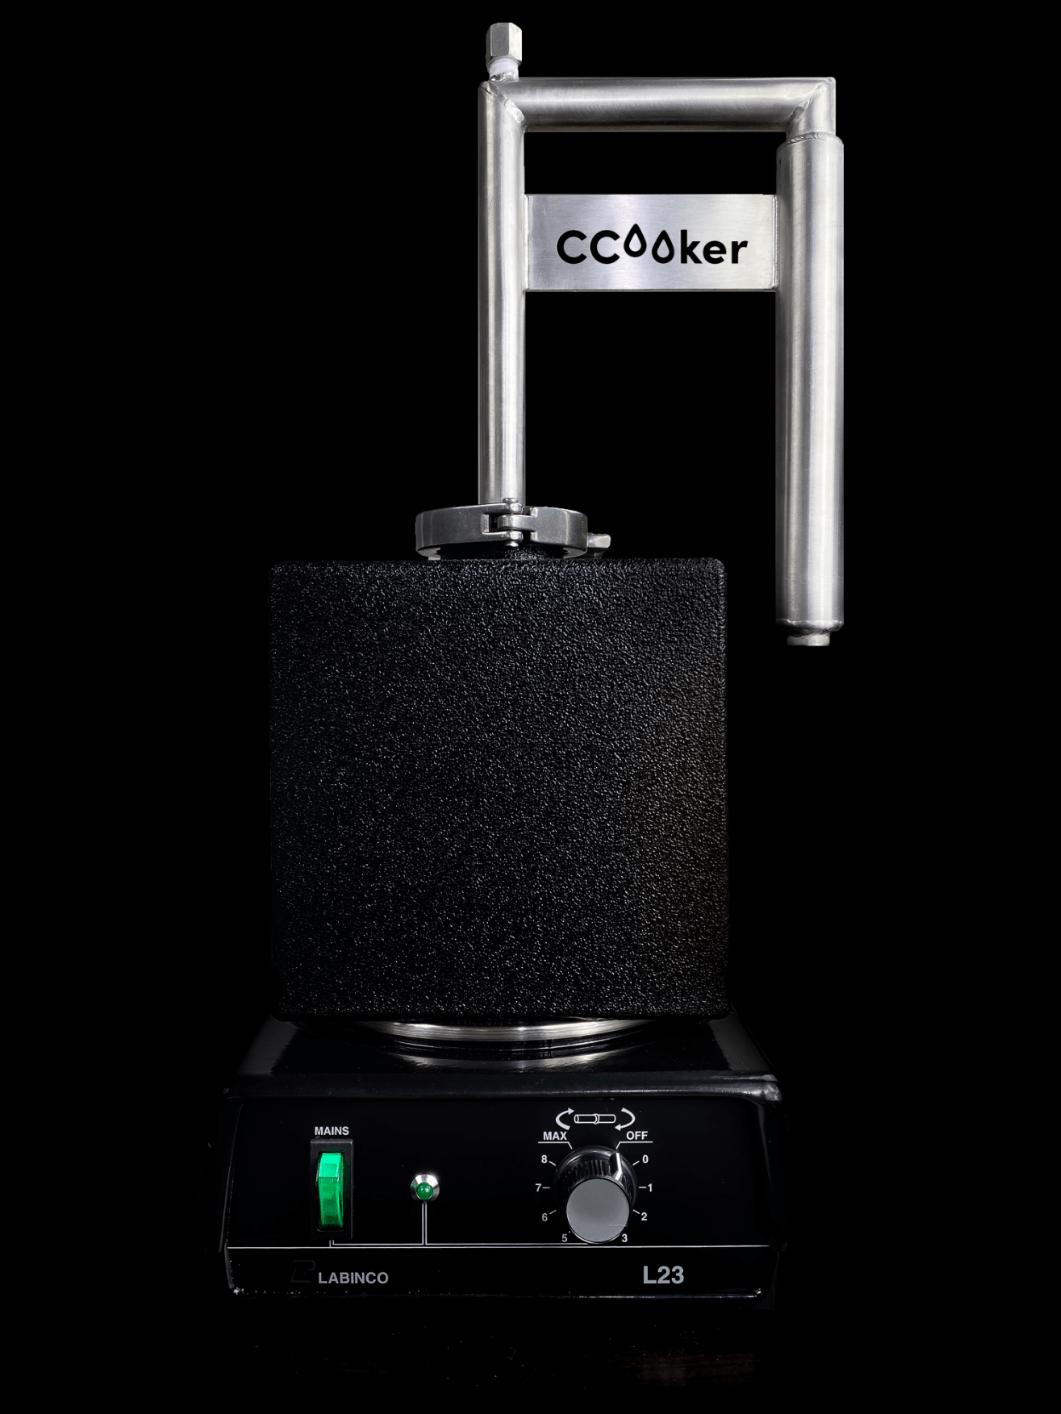 CocktailCooker on heater